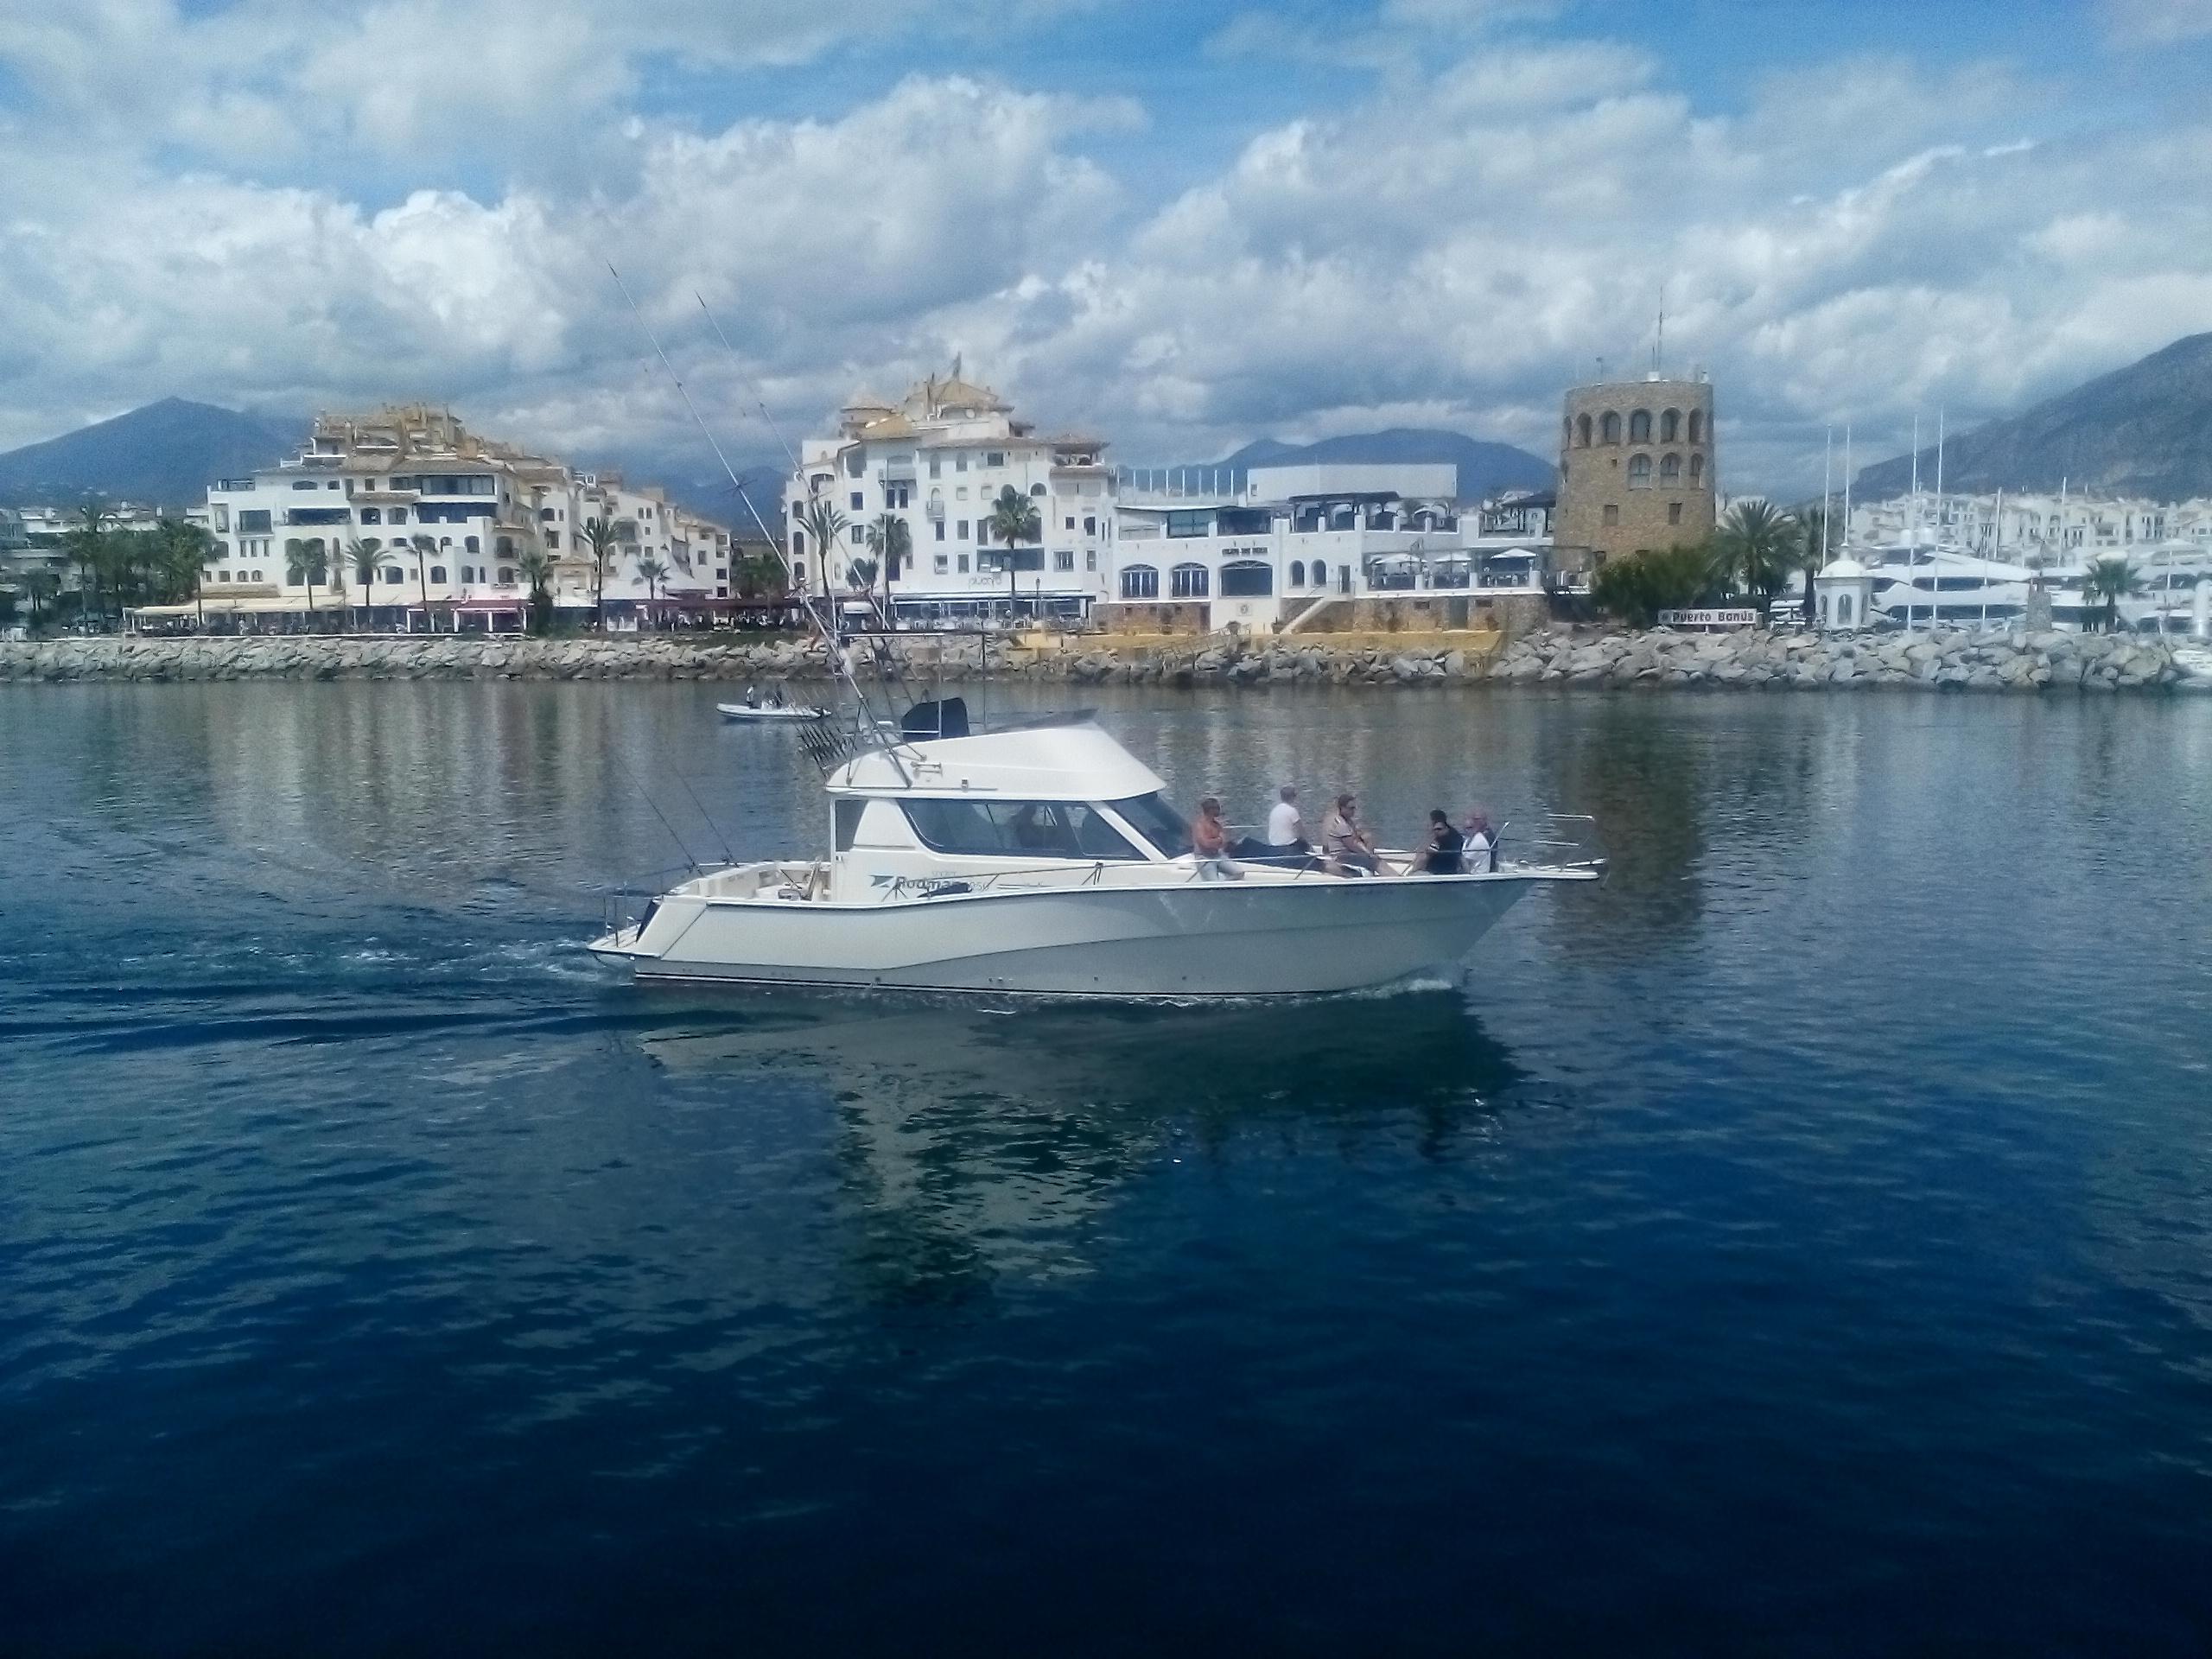 Leaving Puerto Banus / Saliendo de Puerto Banus